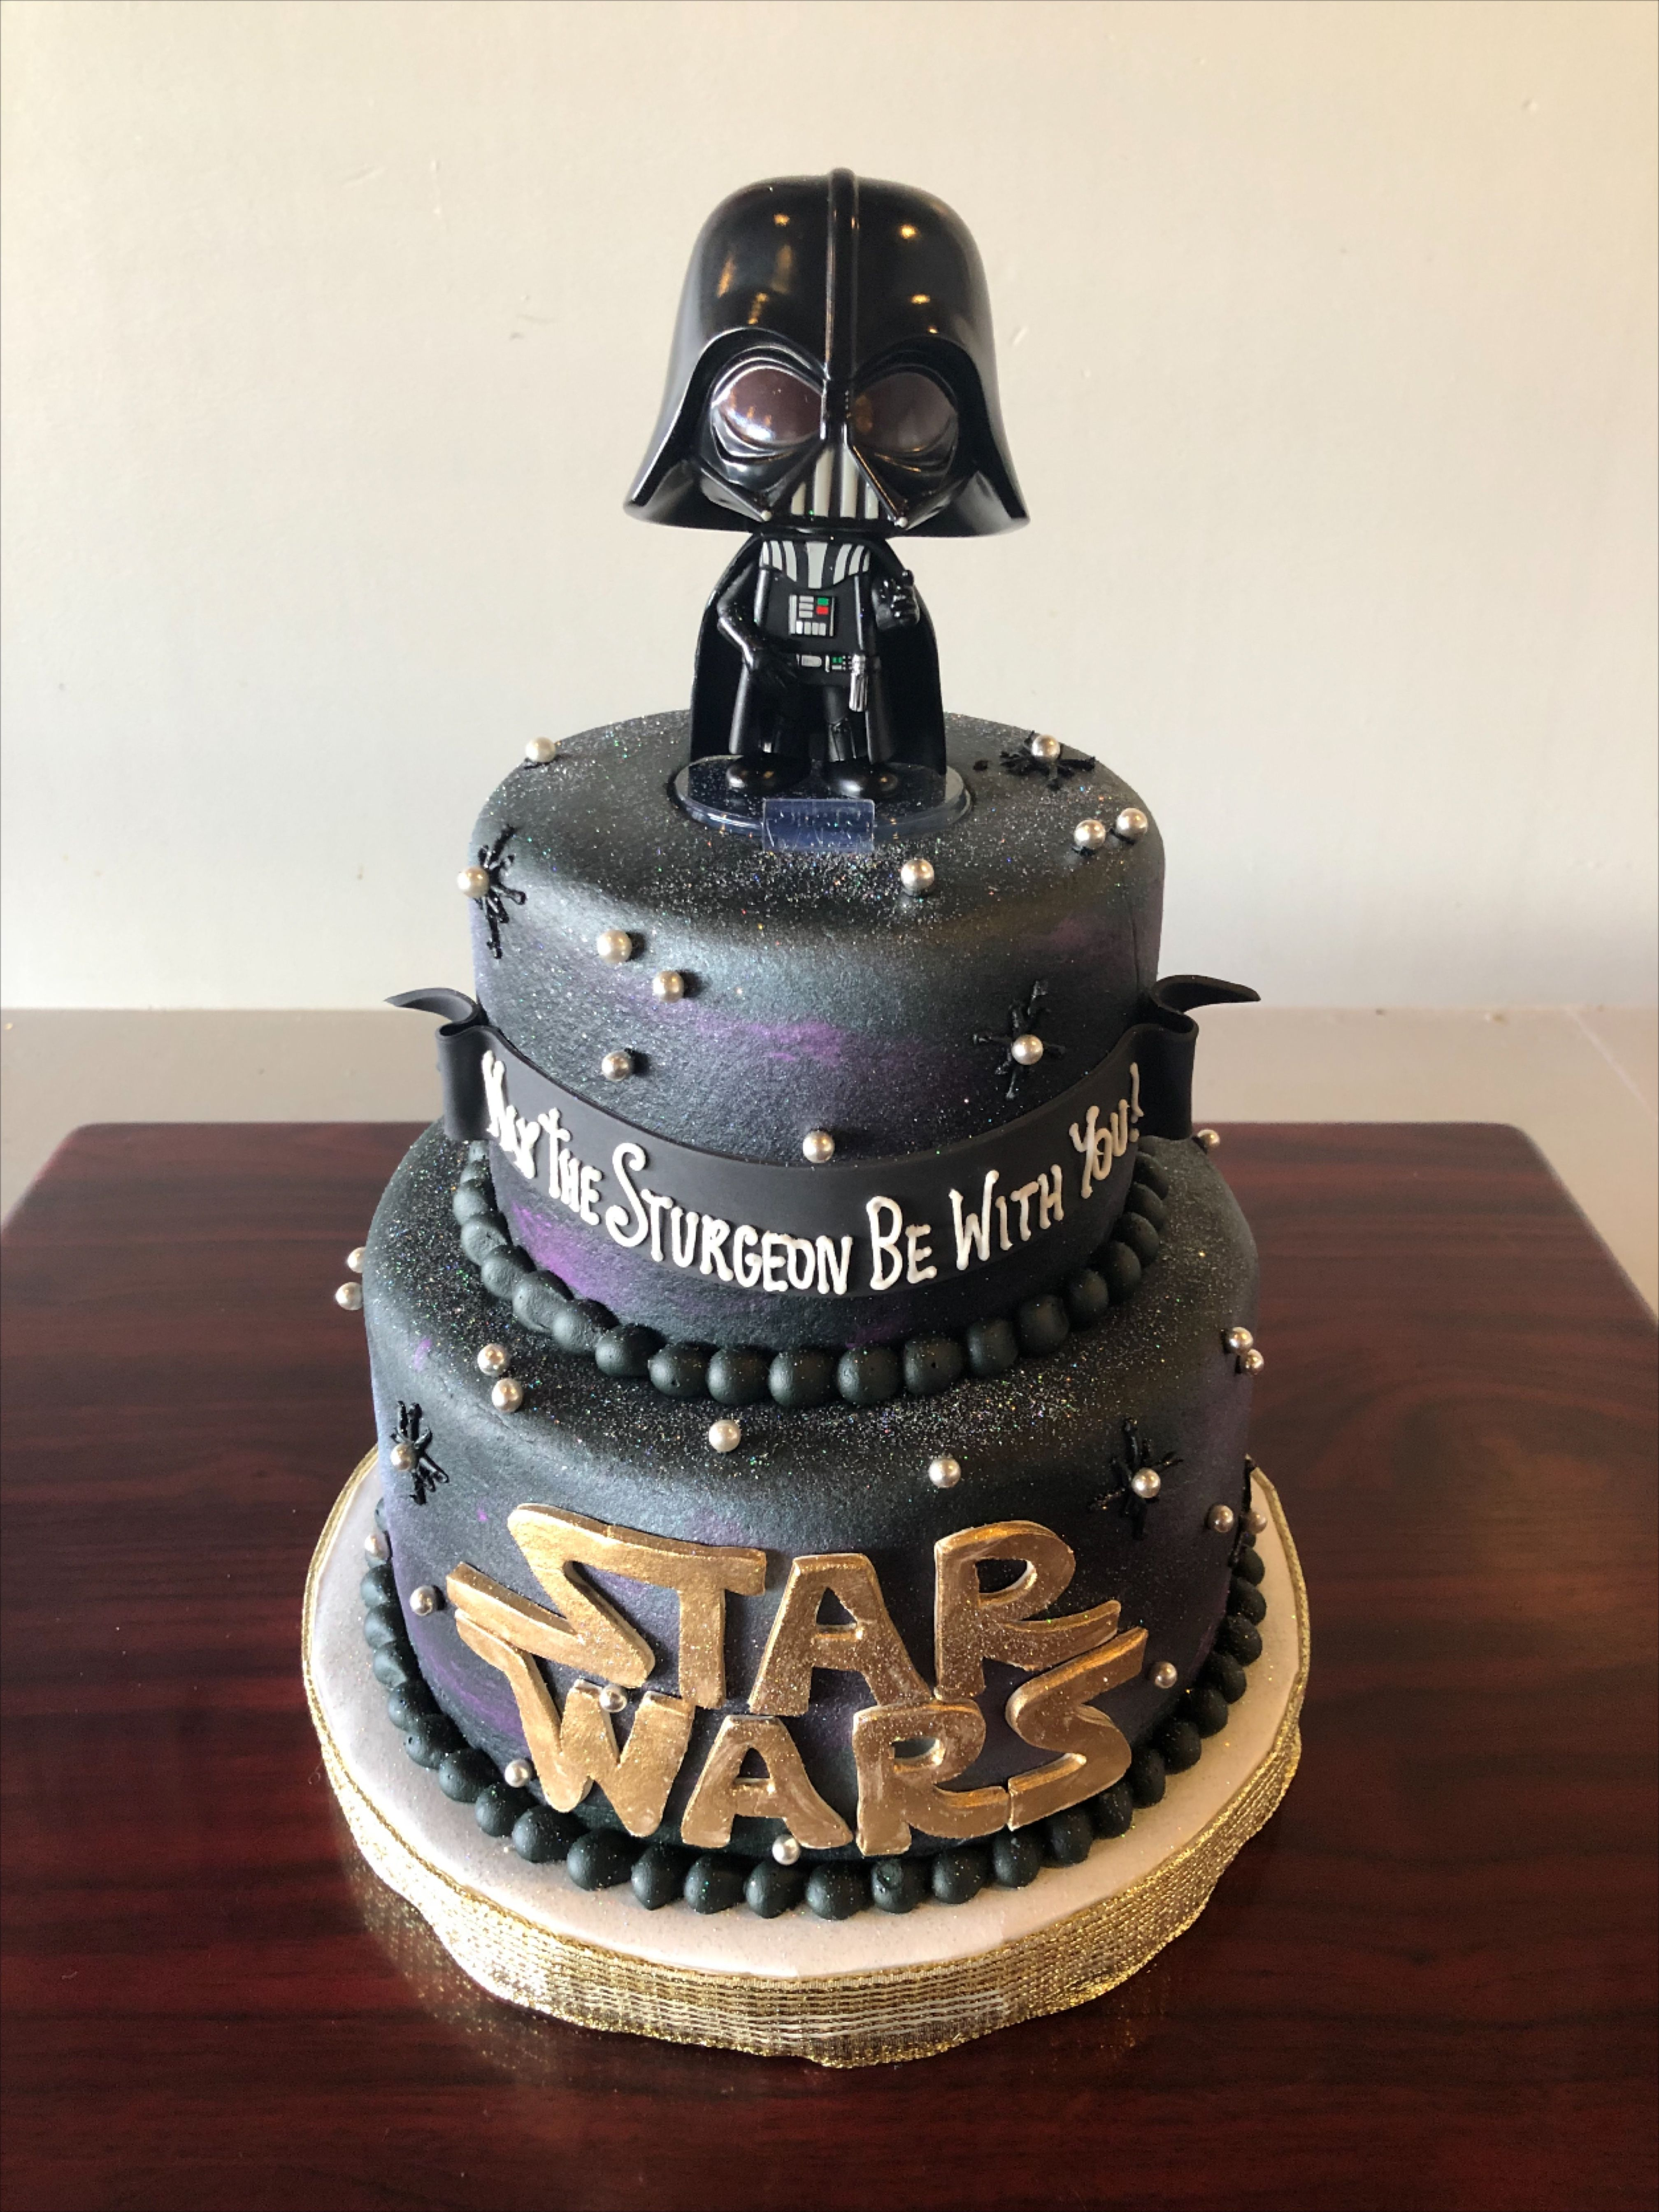 40 Star Wars Cakes Ideas In 2021 Star Wars Cake War Cake Cake